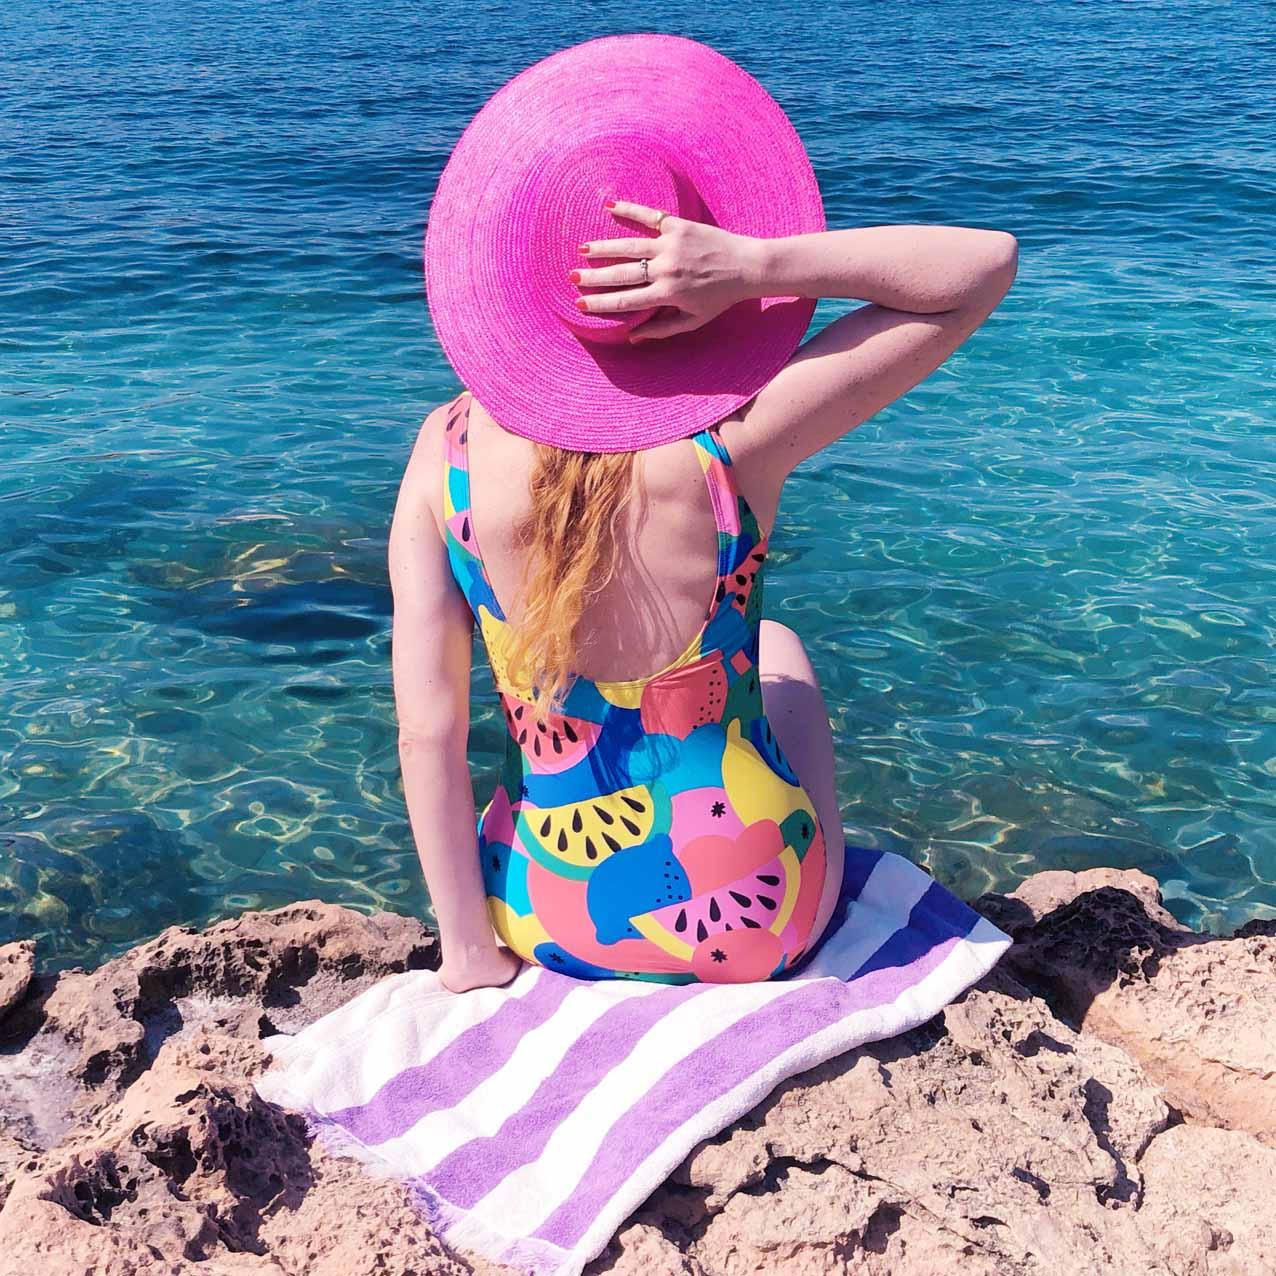 Wearing my Batoko Swimsuit at Cala Gracioneta!